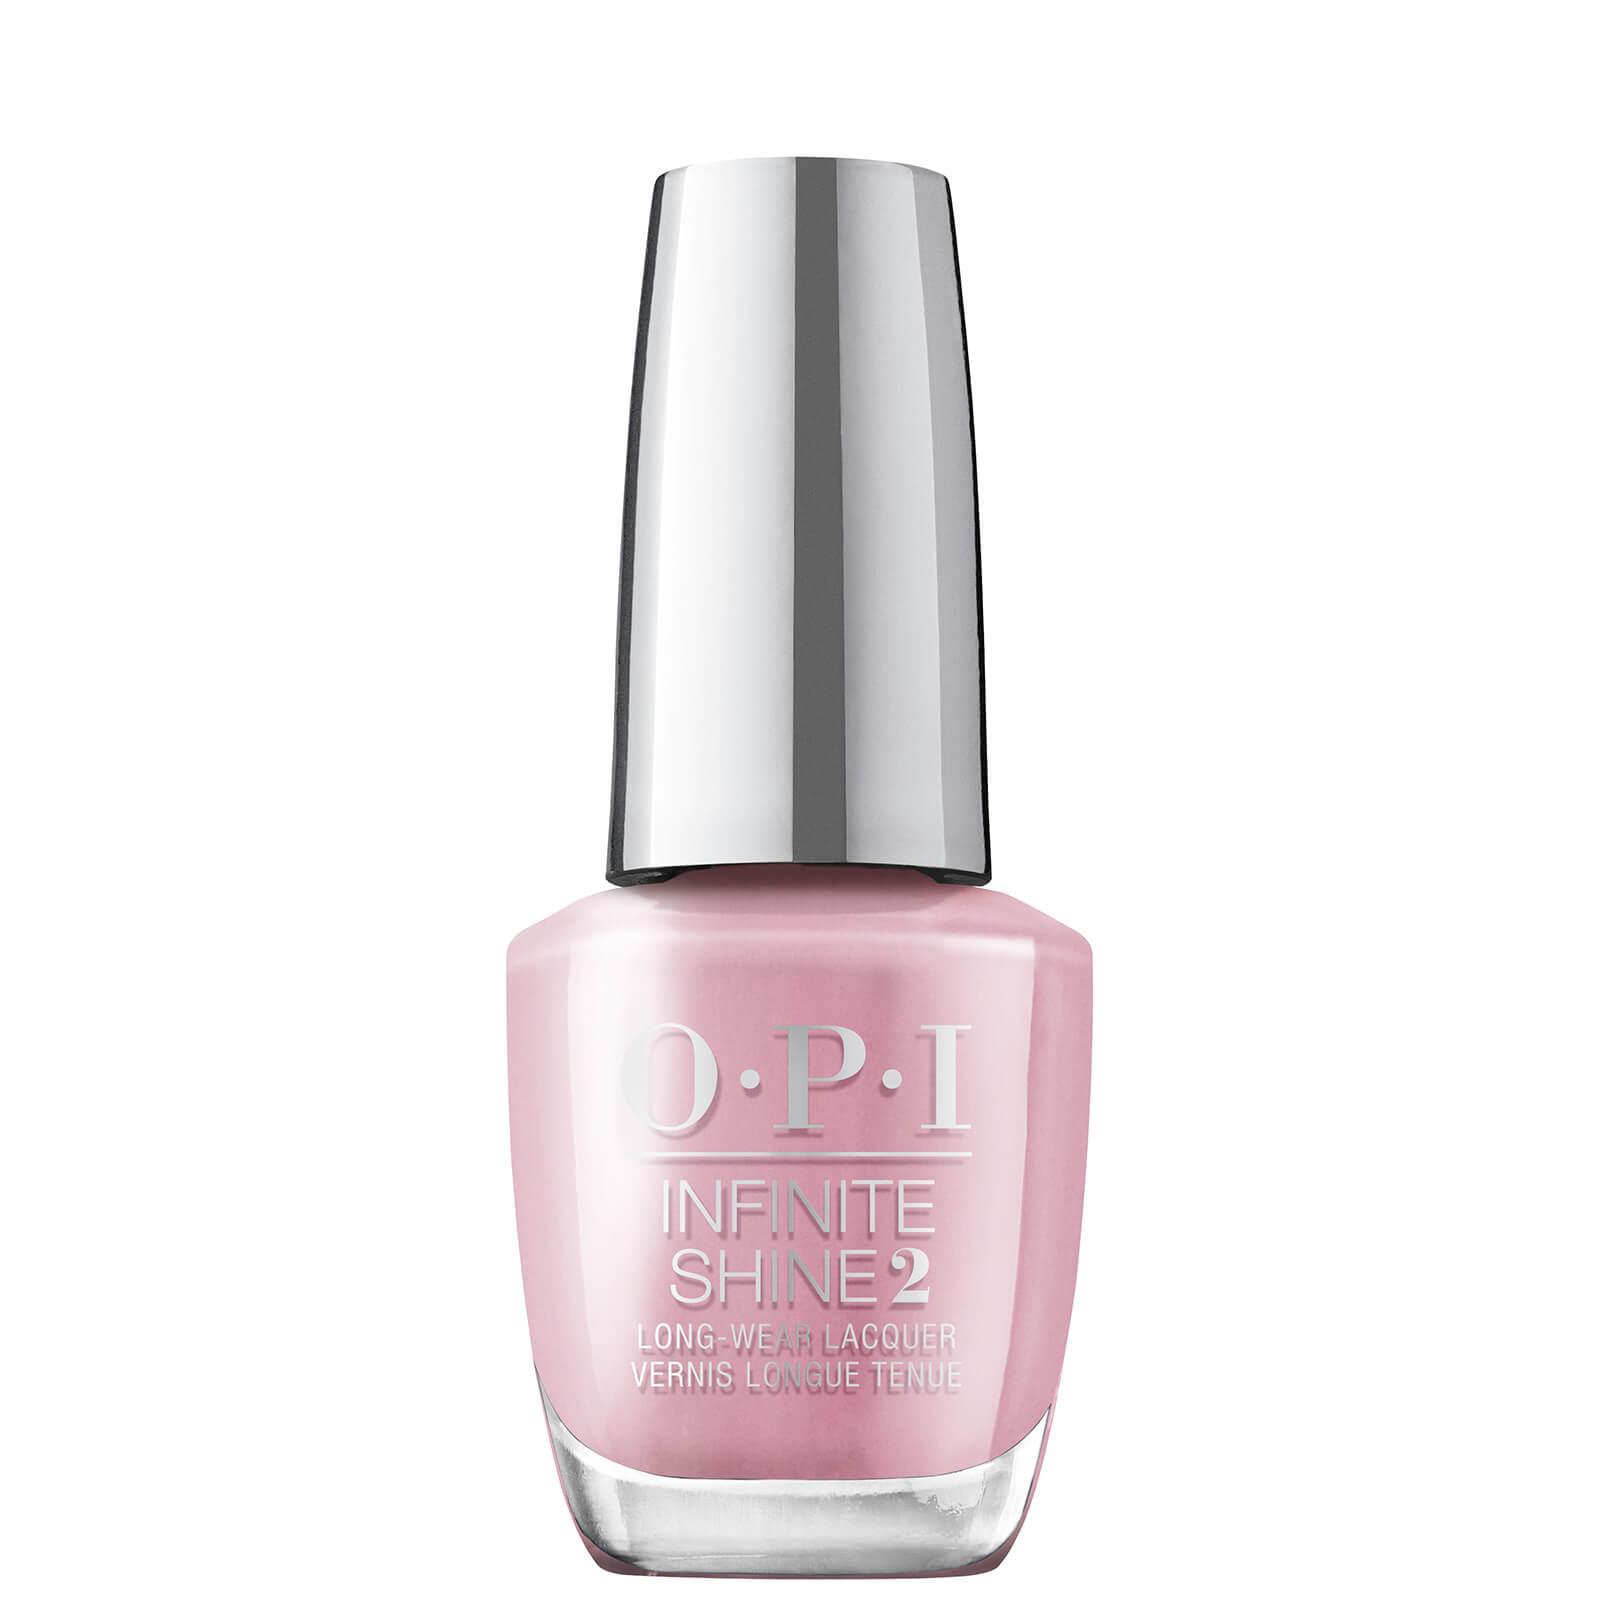 Купить OPI DTLA Collection Infinite Shine Long-wear Nail Polish 15ml (Various Shades) - (P)Ink on Canvas